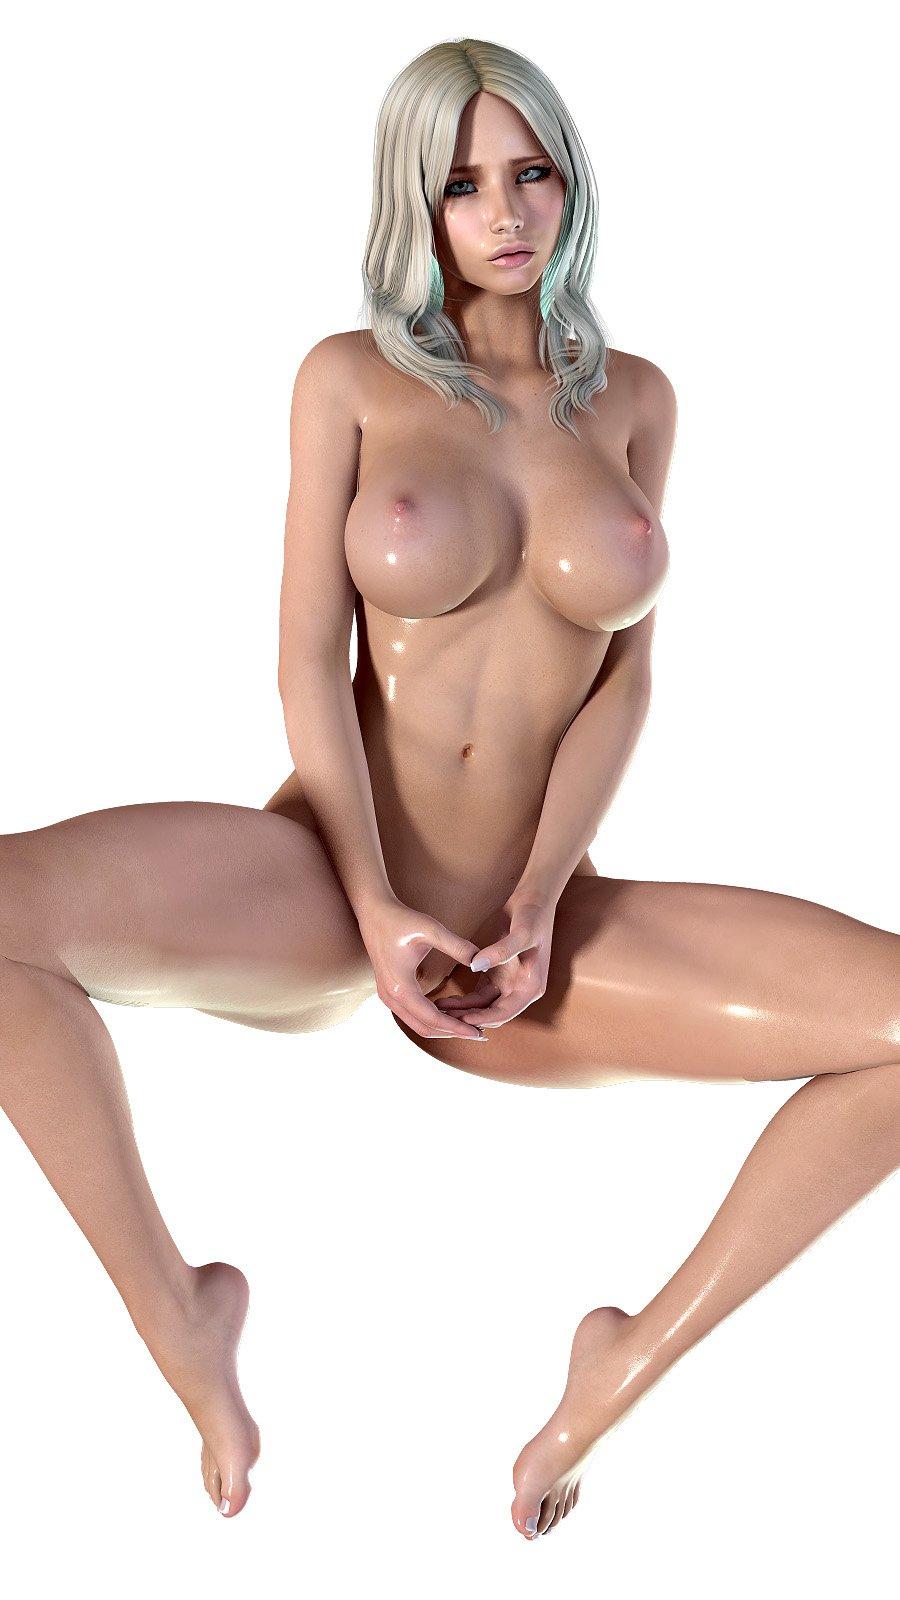 Nude 3d video gallary erotica pics